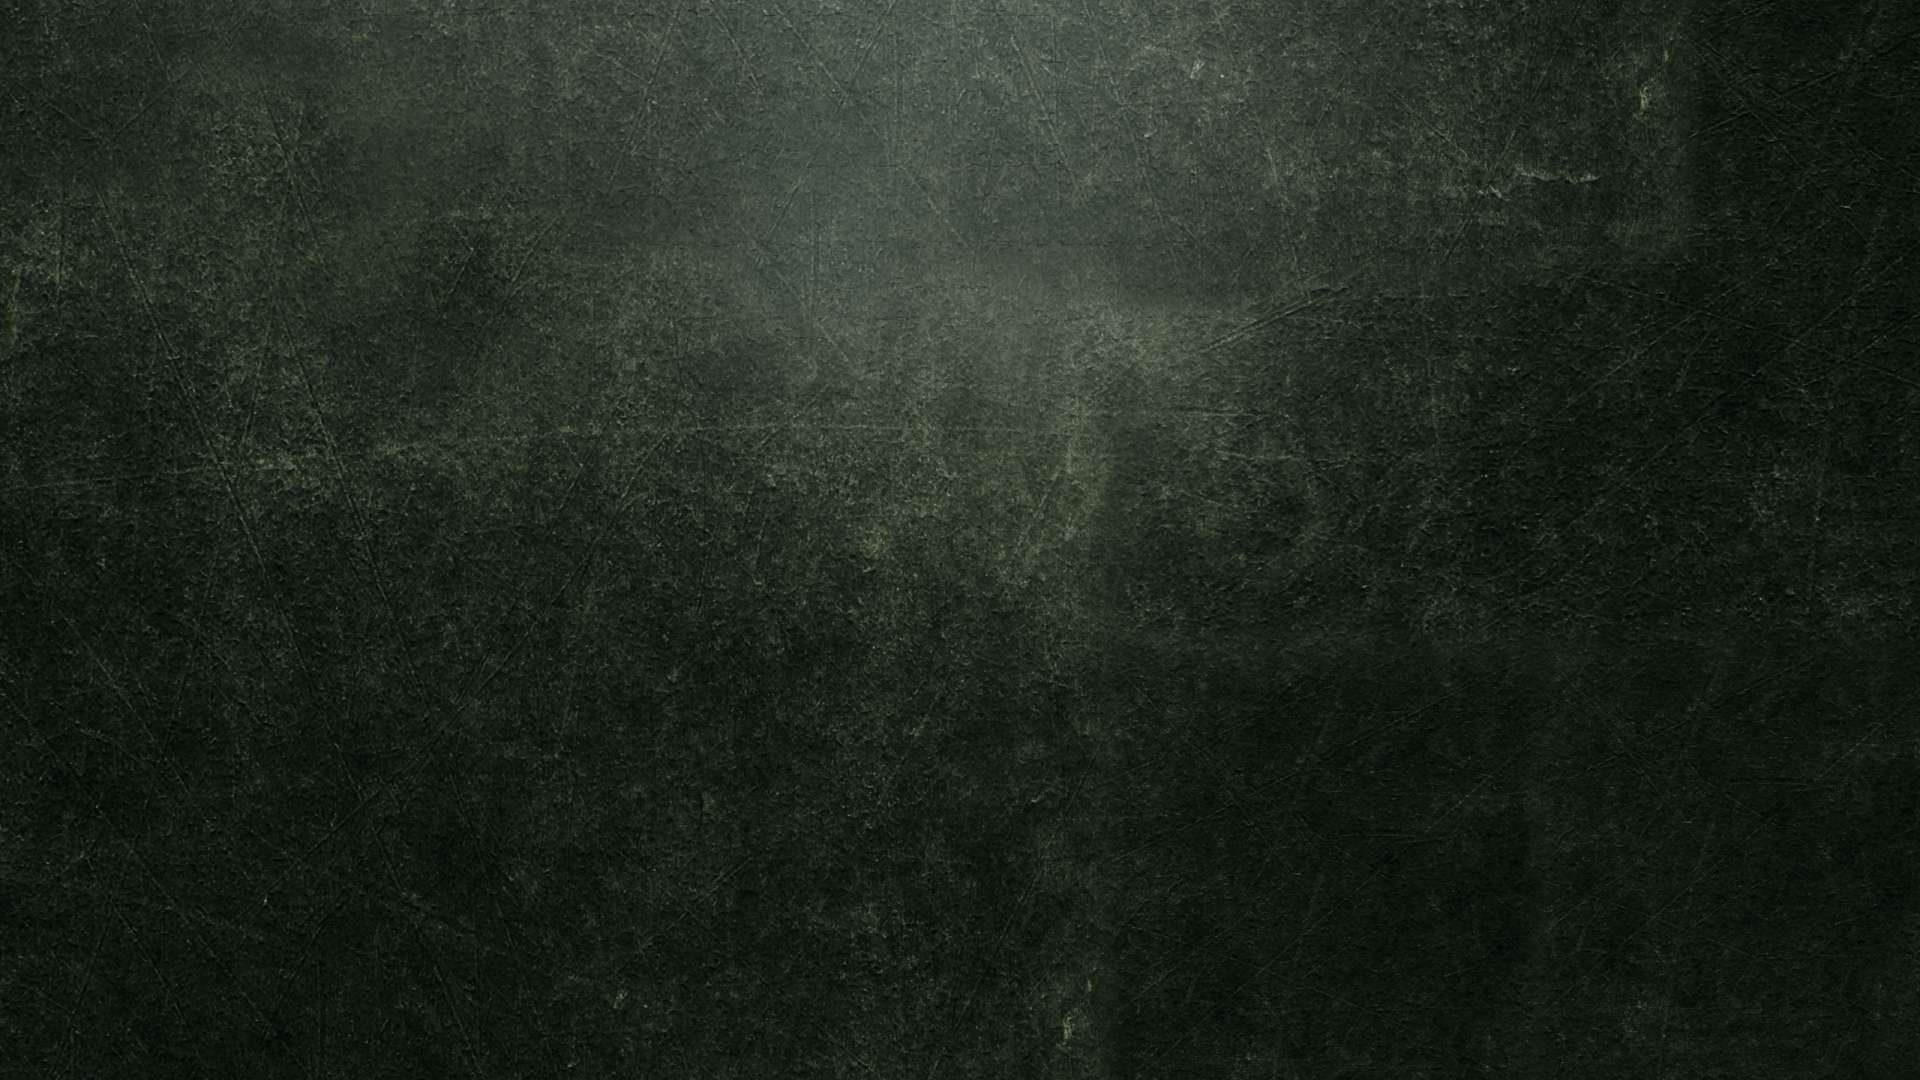 49+ 1080P Minimalist Wallpaper on WallpaperSafari